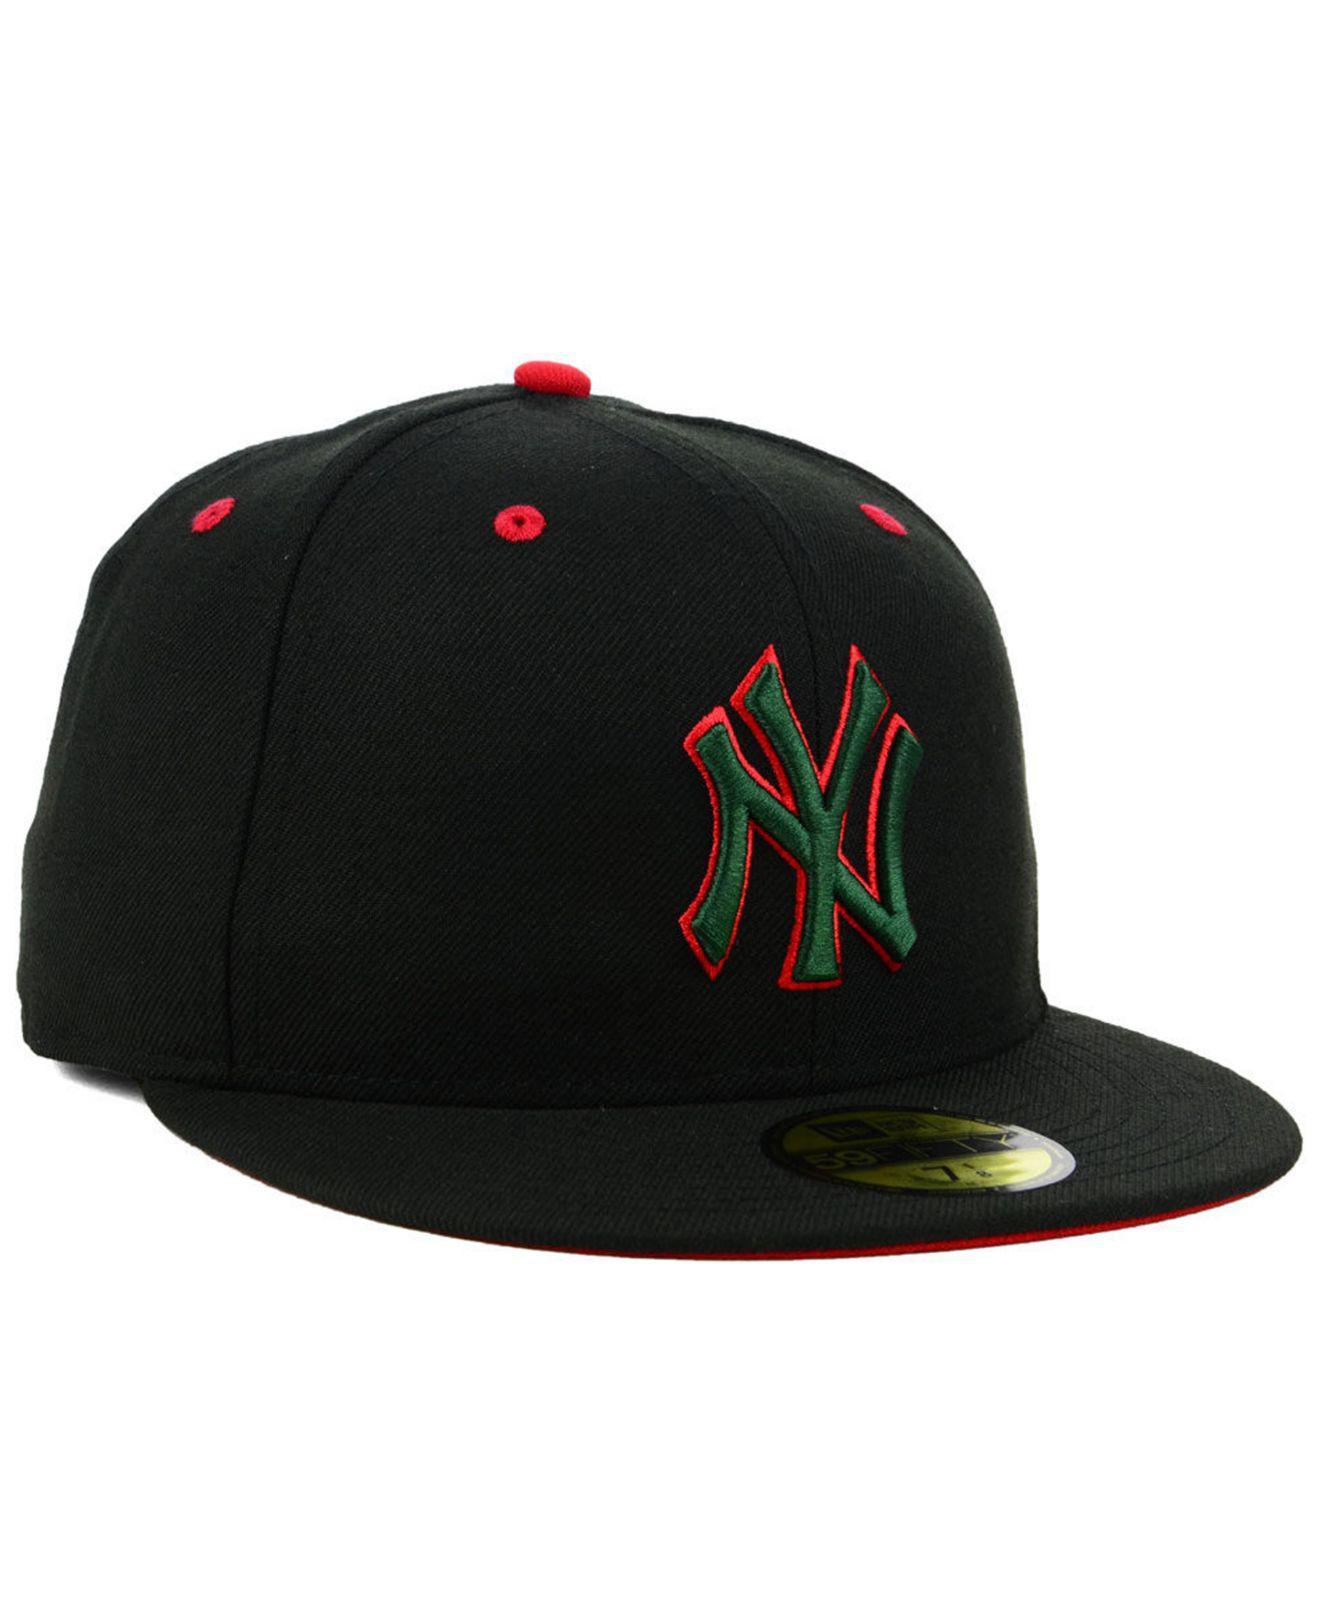 9c5fd21ee02 ... switzerland new york yankees italian 59fifty fitted cap for men lyst.  view fullscreen d815d 7f87f ...